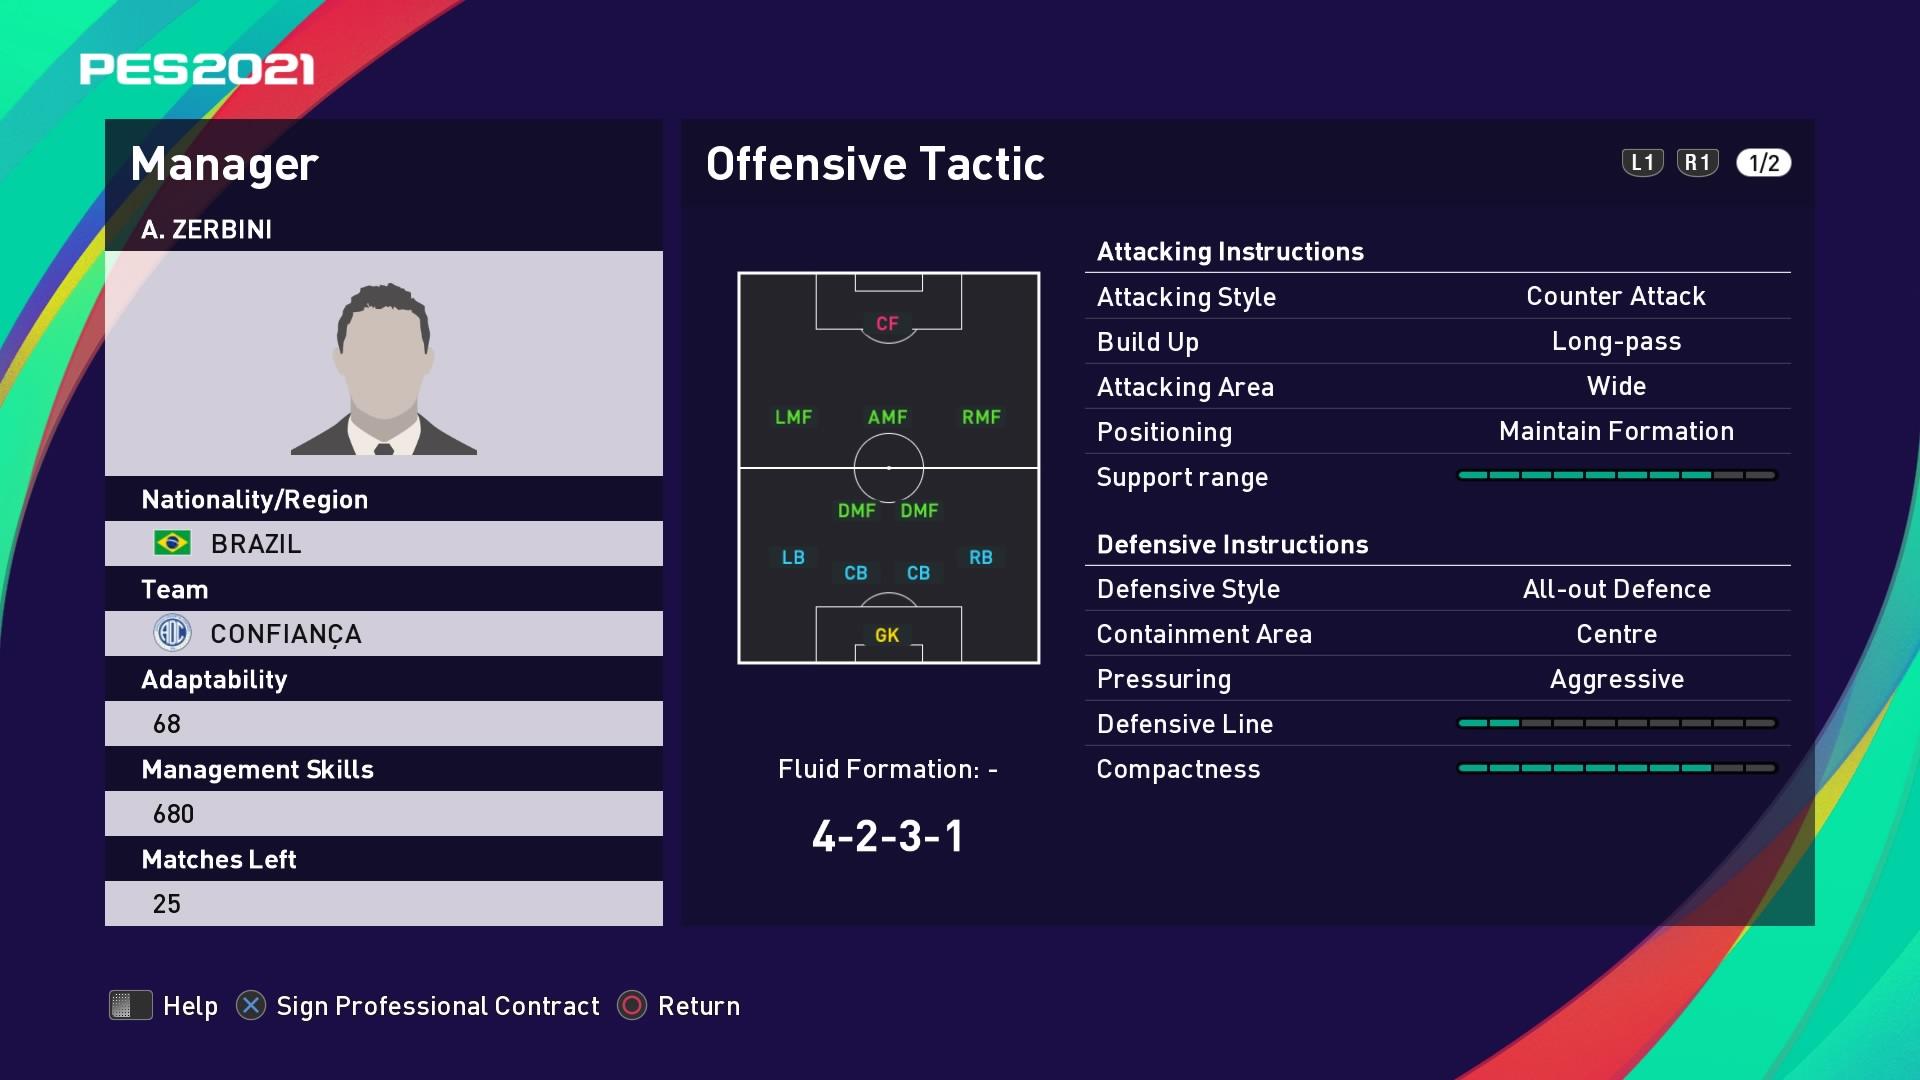 A. Zerbini (Matheus Costa) Offensive Tactic in PES 2021 myClub